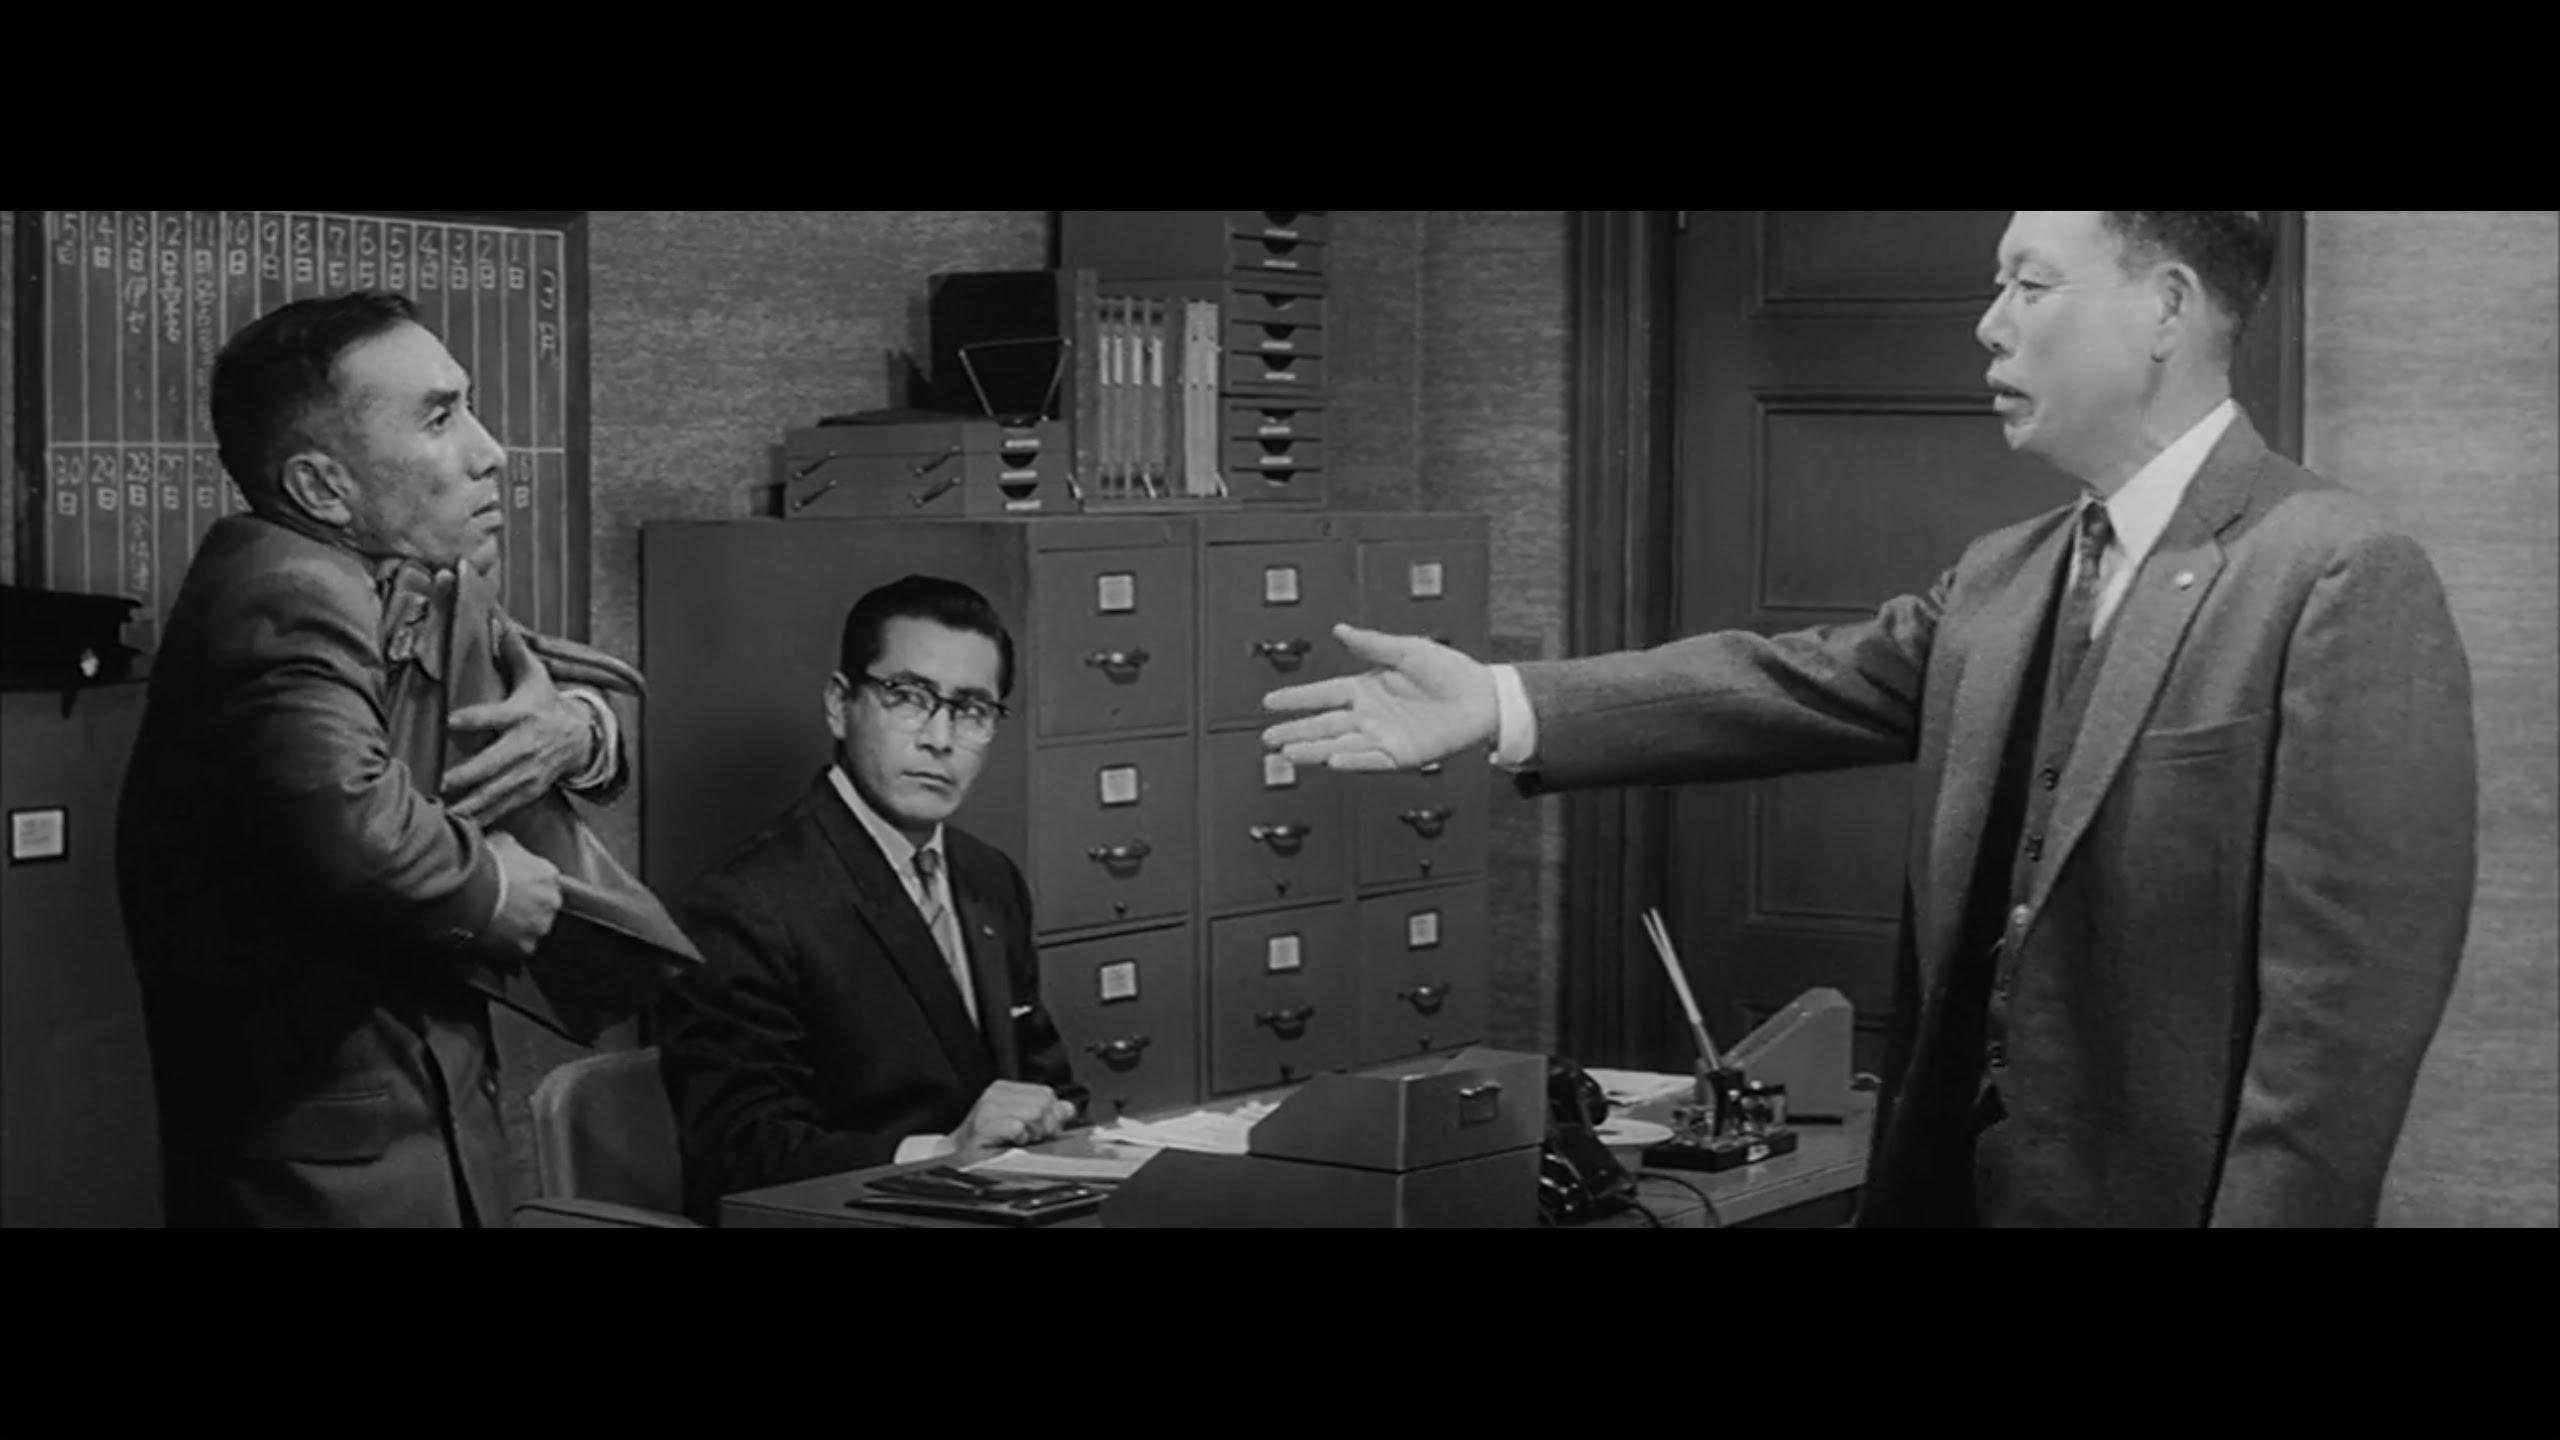 Akira Kurosawa U0026 39 S Masterful Use Of Geometry In The Staging Of A Scene From The 1960 Film  U0026 39 The Bad